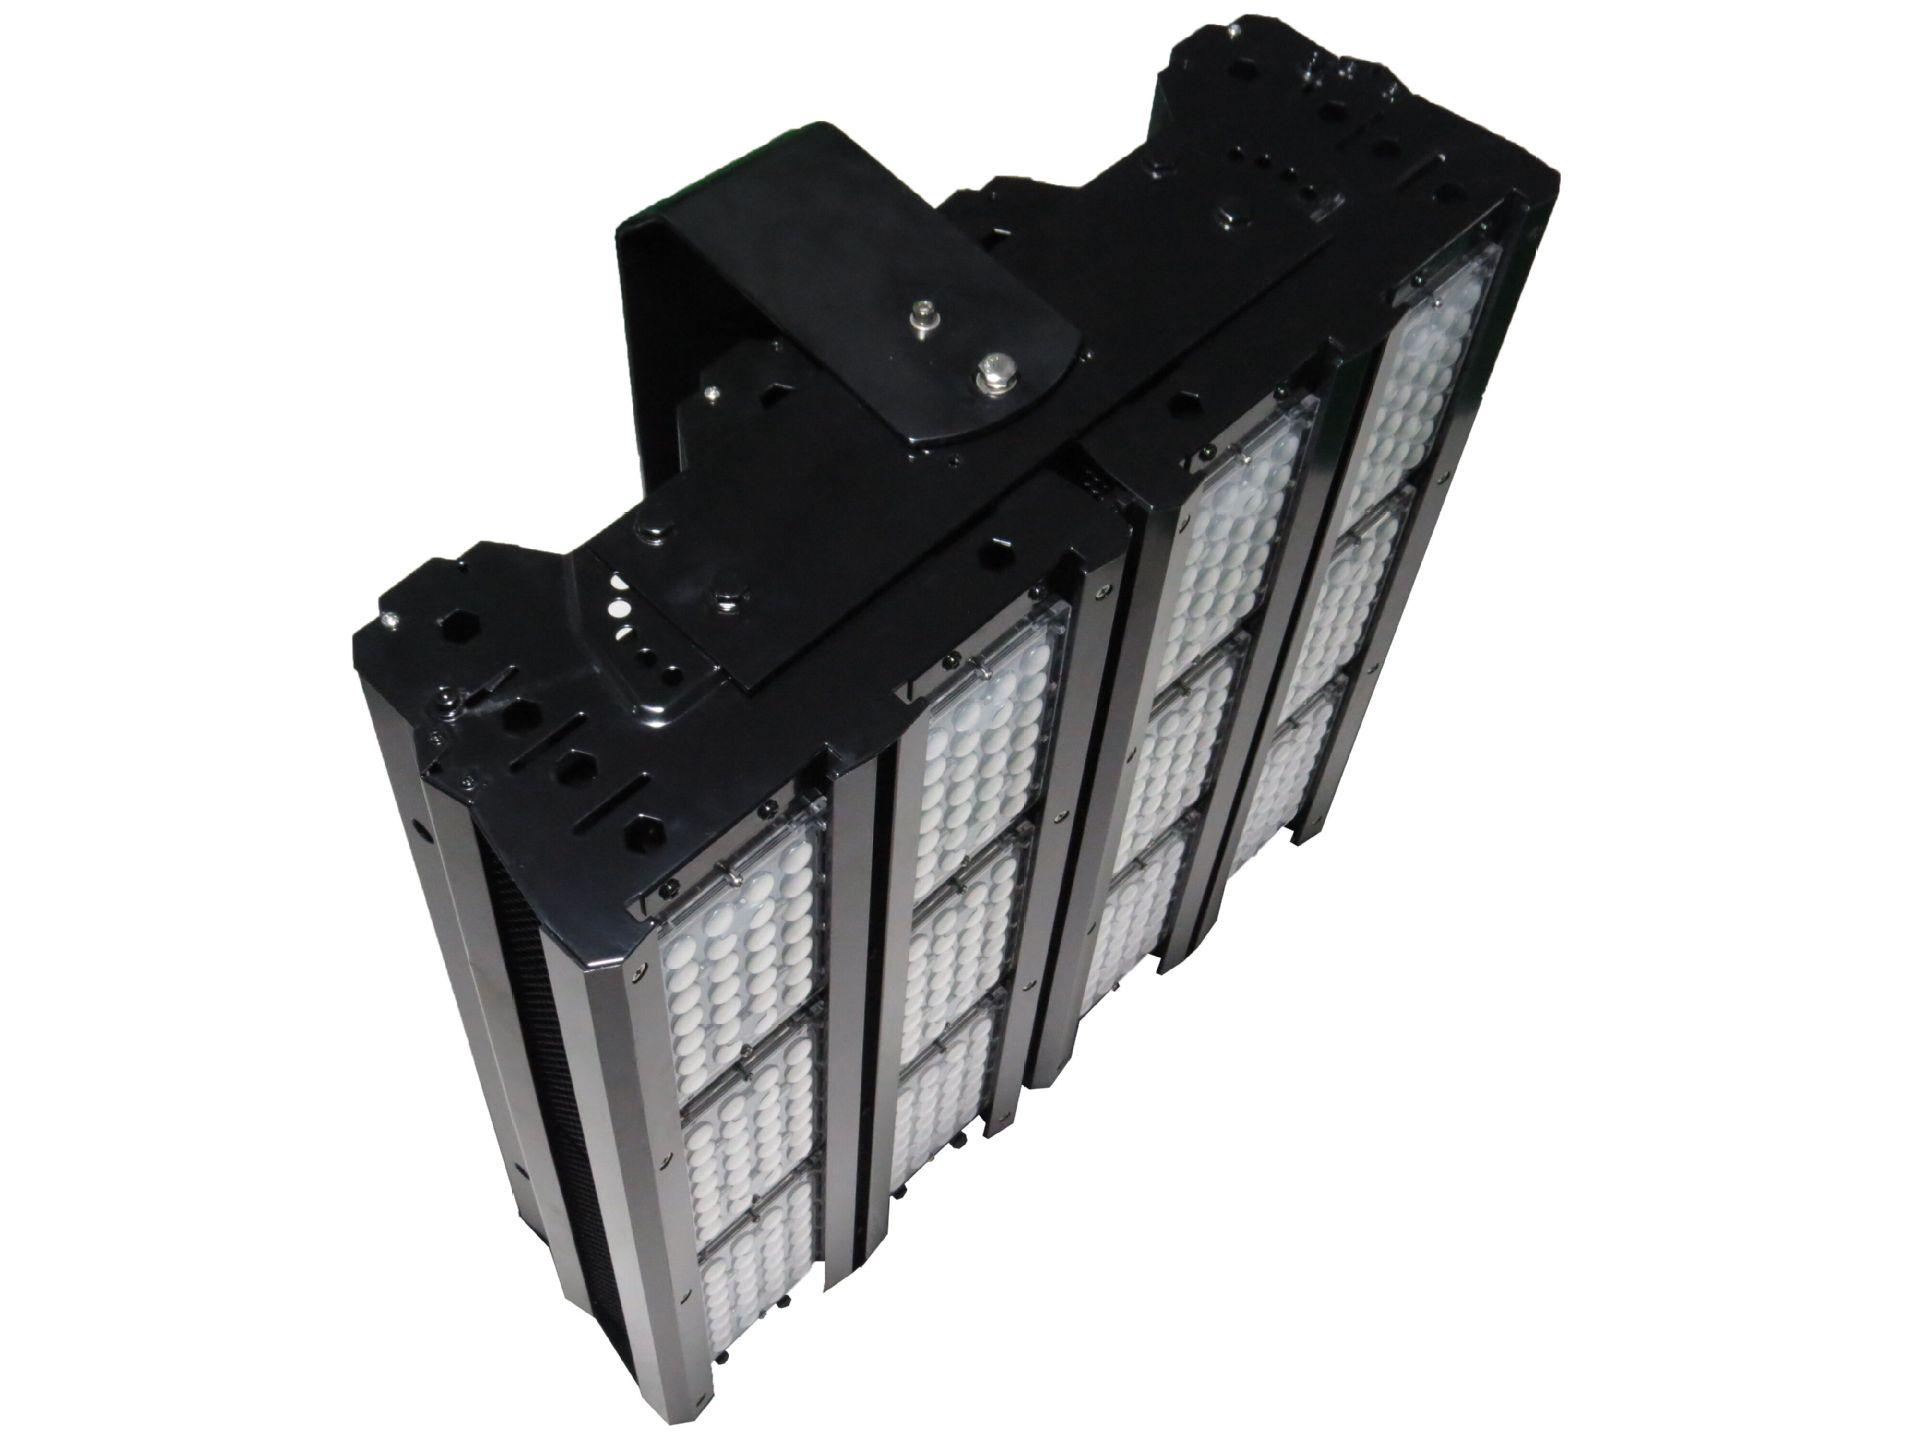 1000W 120LM/W IP65 IP66 LED Floodlight stadium light Sports lighting 2